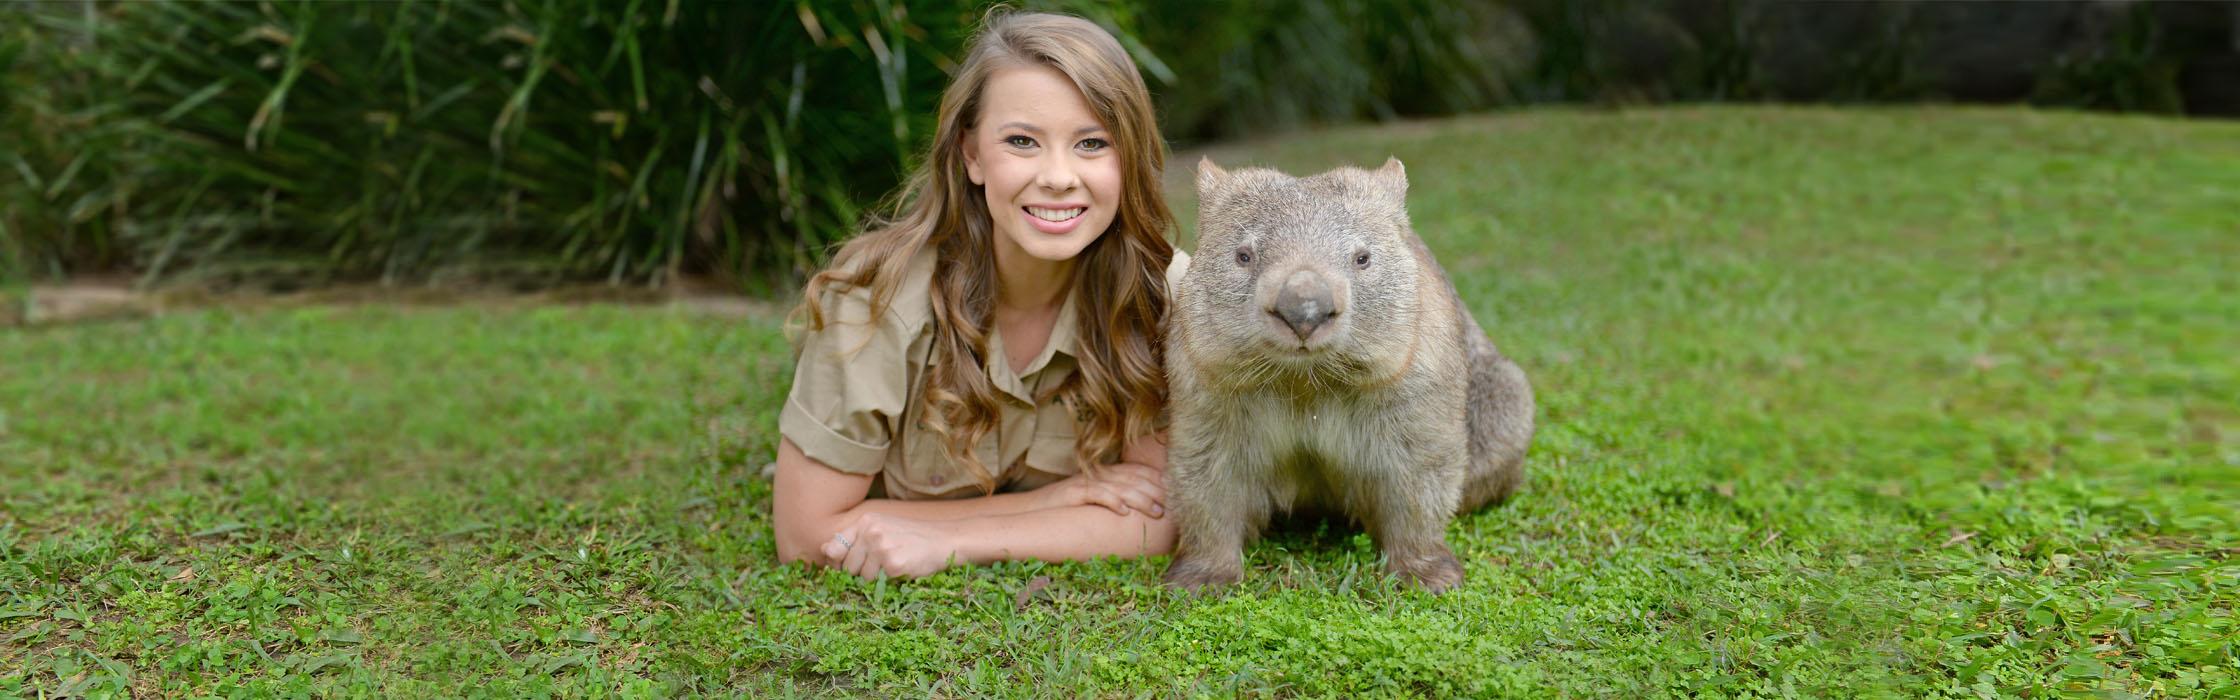 Experiences-Animal Encounters-Naughty Wombat Encounter 2 2240x700